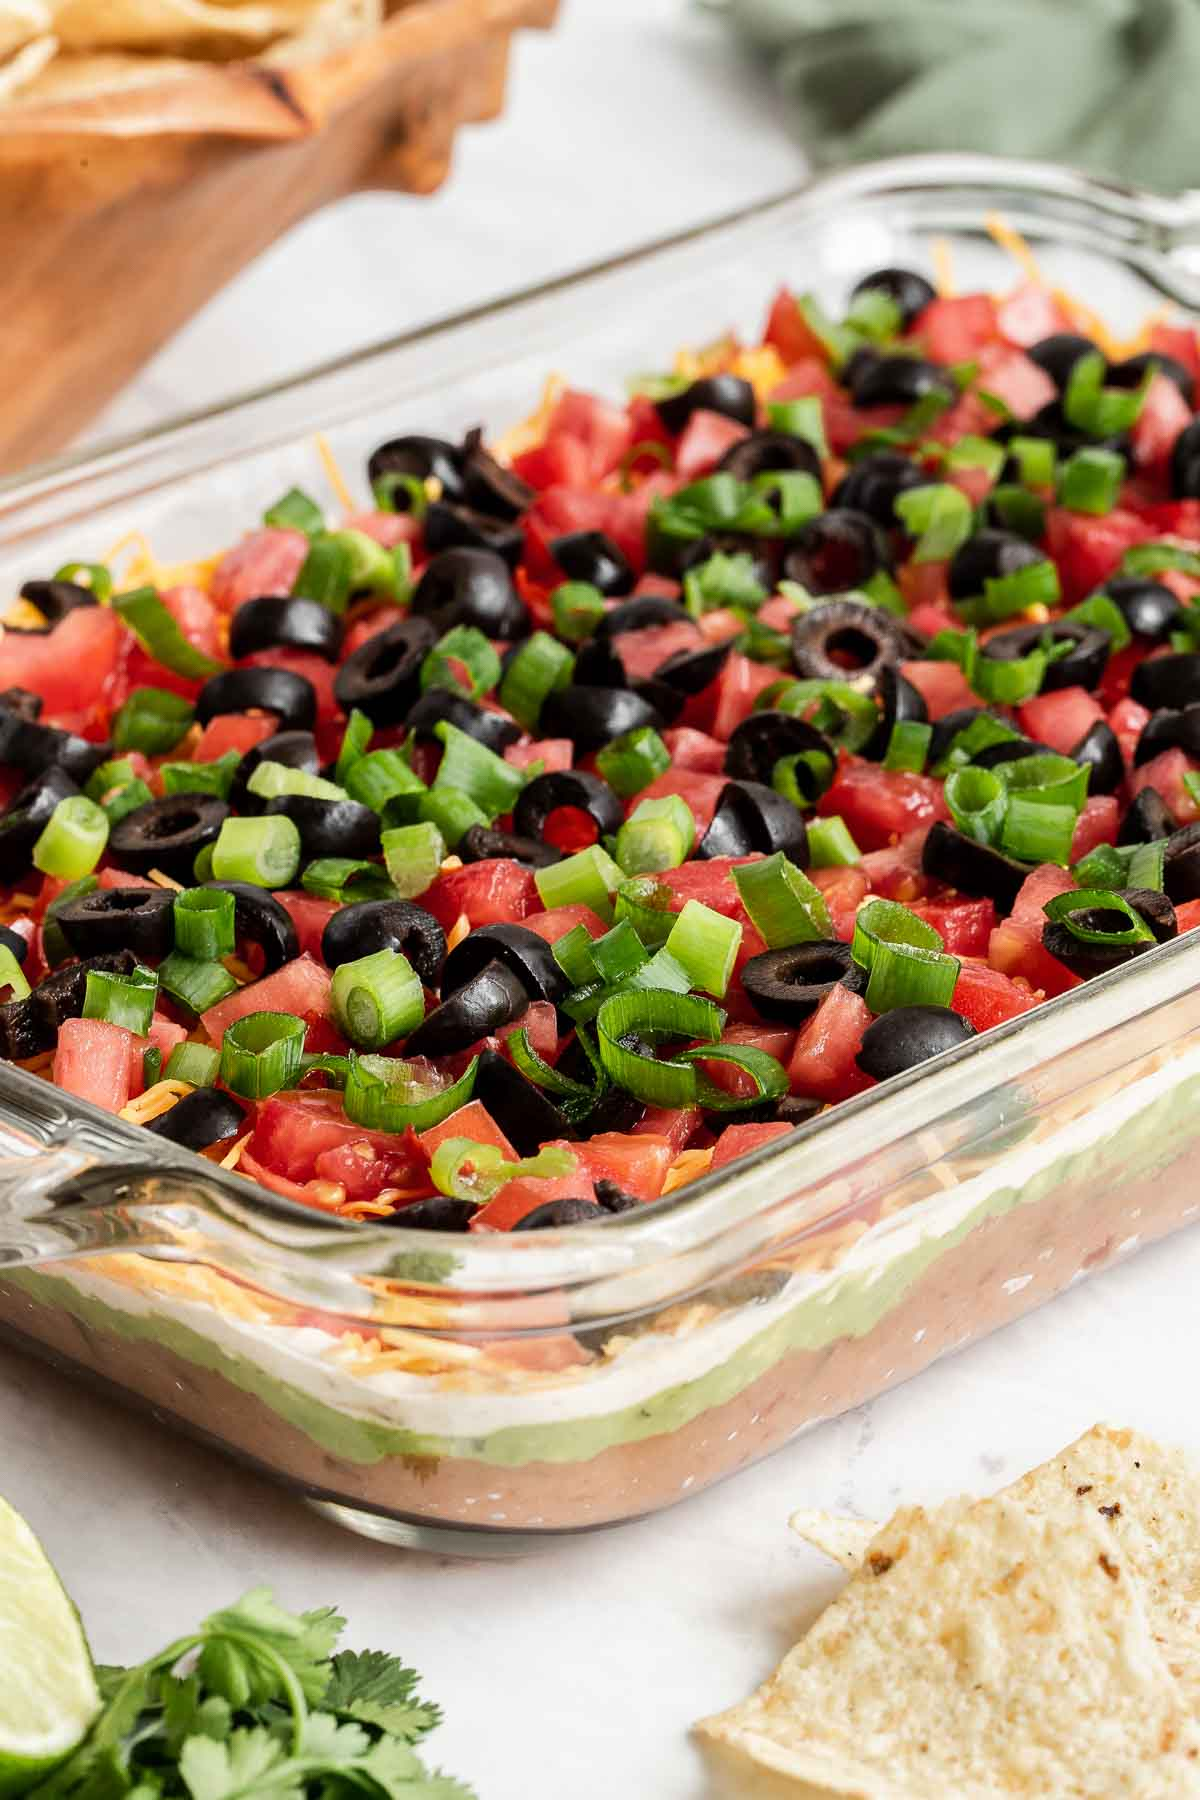 7 layer bean dip in a clear glass dish.